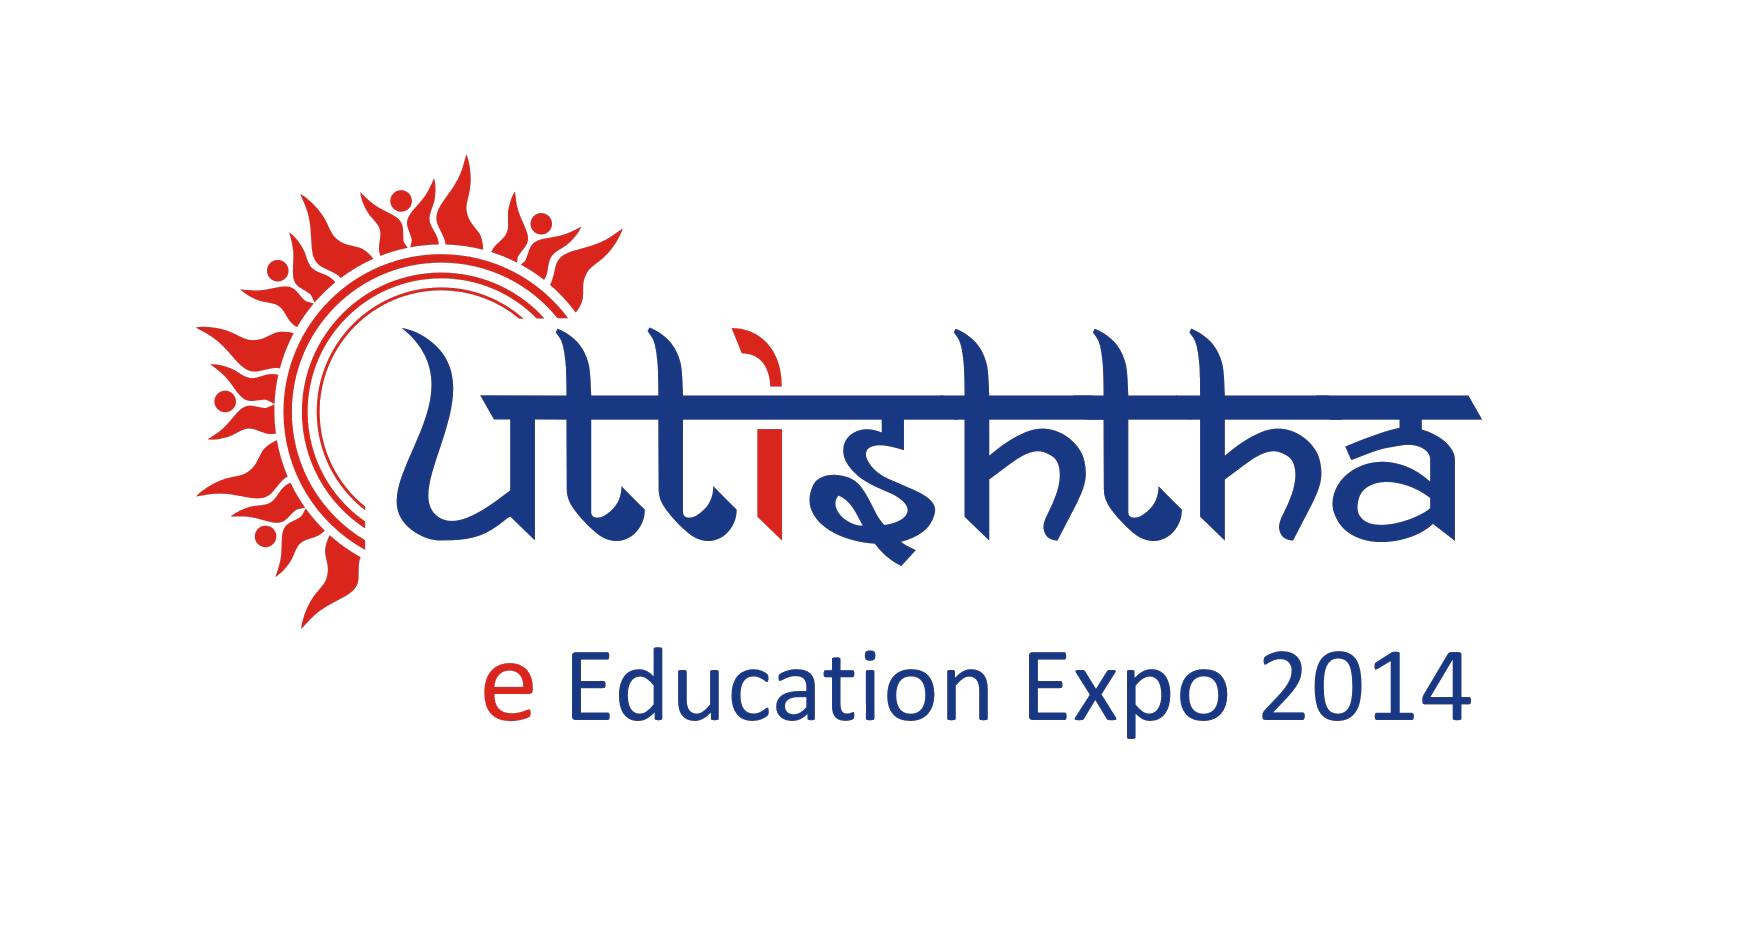 Uttishtha e-Education Expo 2014 logo